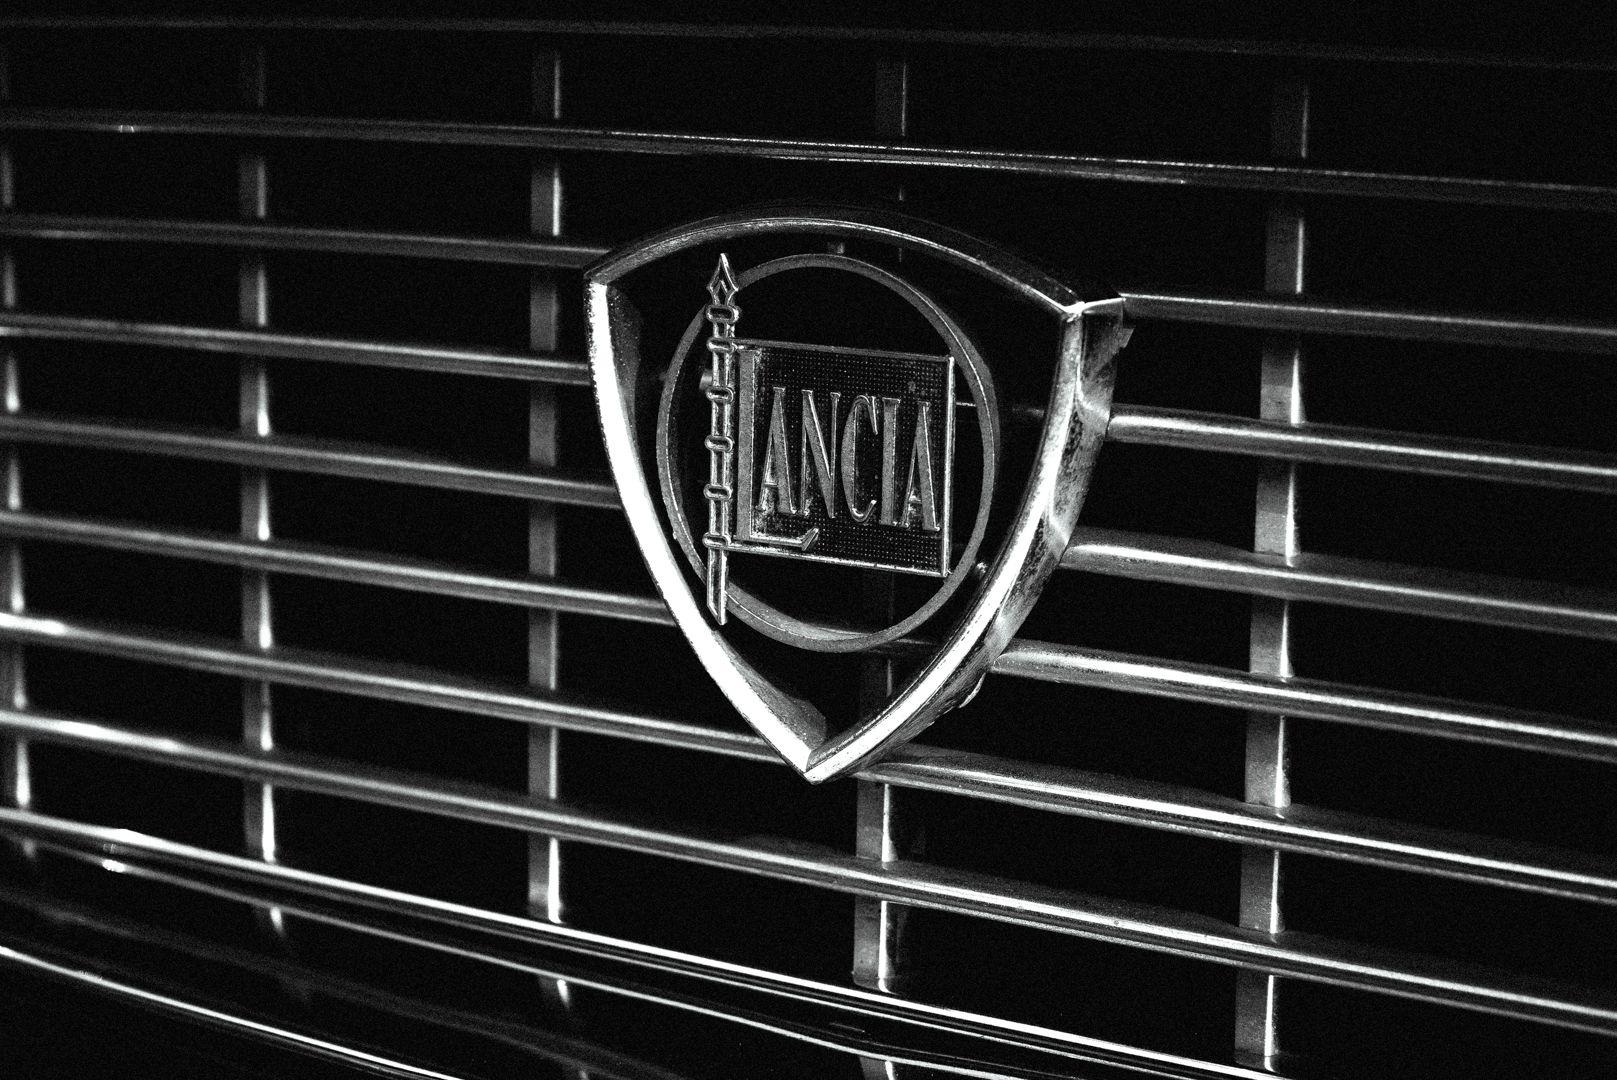 1968 Lancia Flaminia Touring Convertible 2800 3C 79158